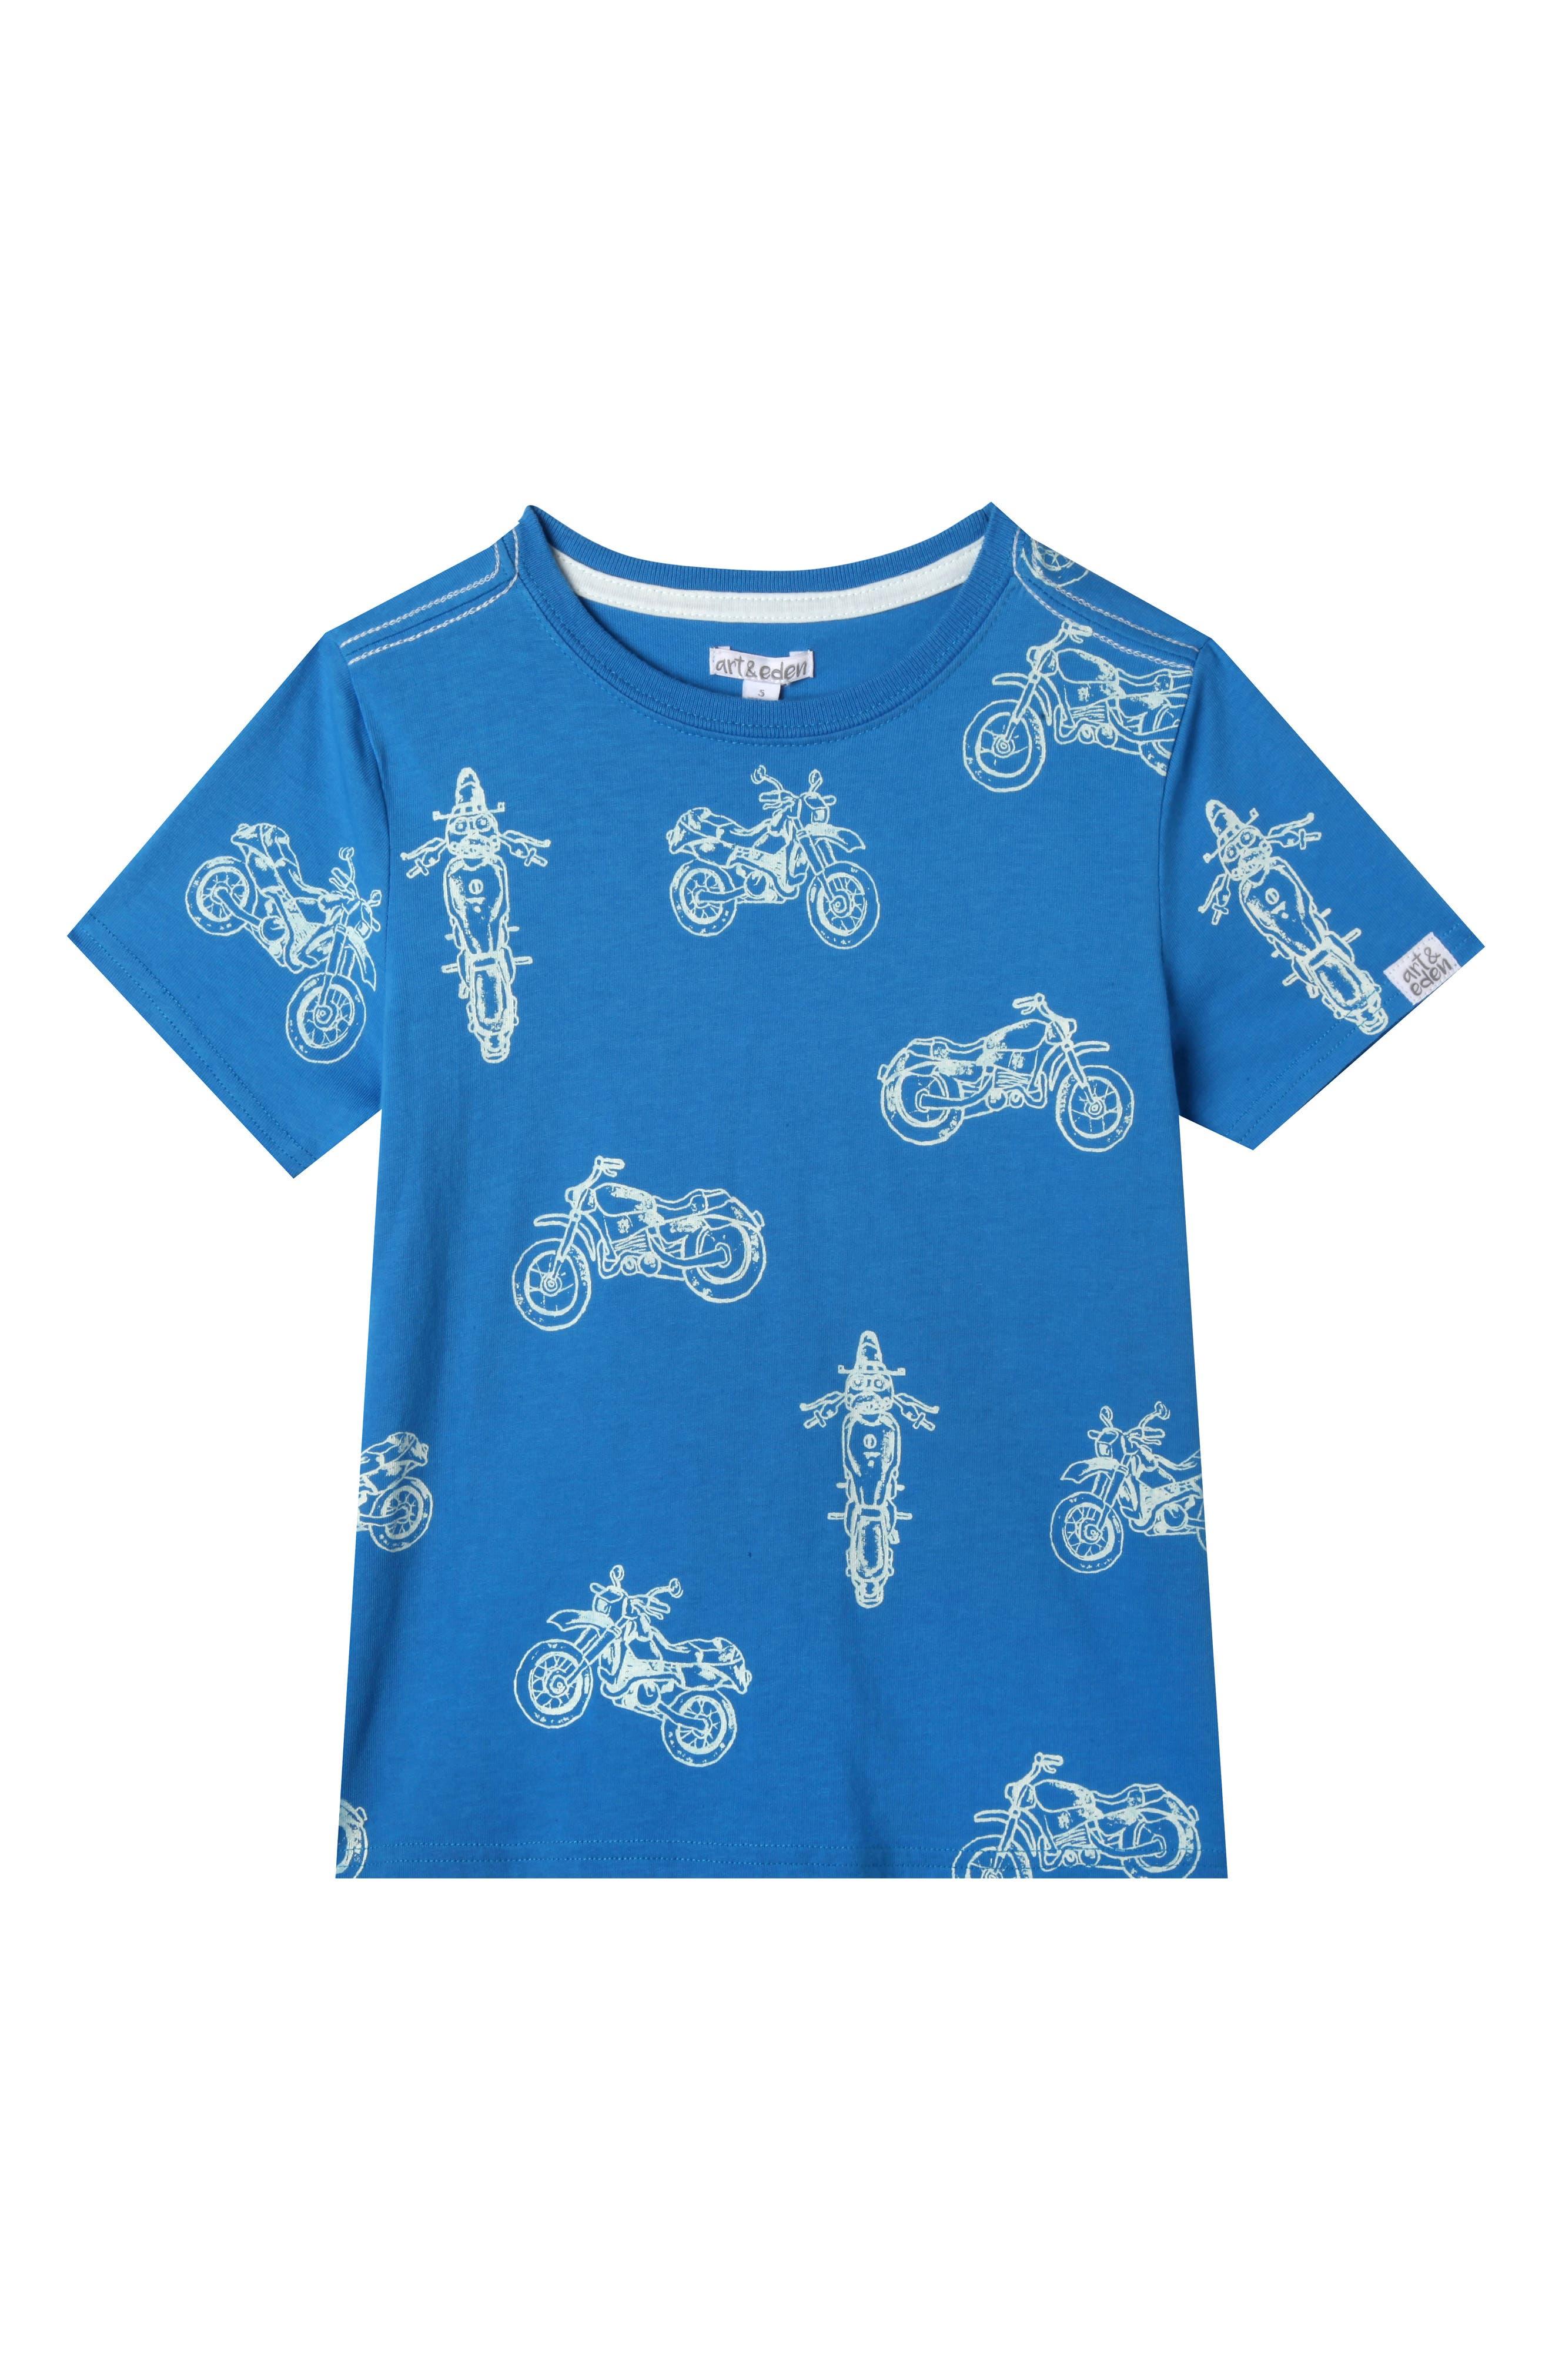 Sebastian Motorcycle Organic Cotton T-Shirt,                         Main,                         color, French Blue